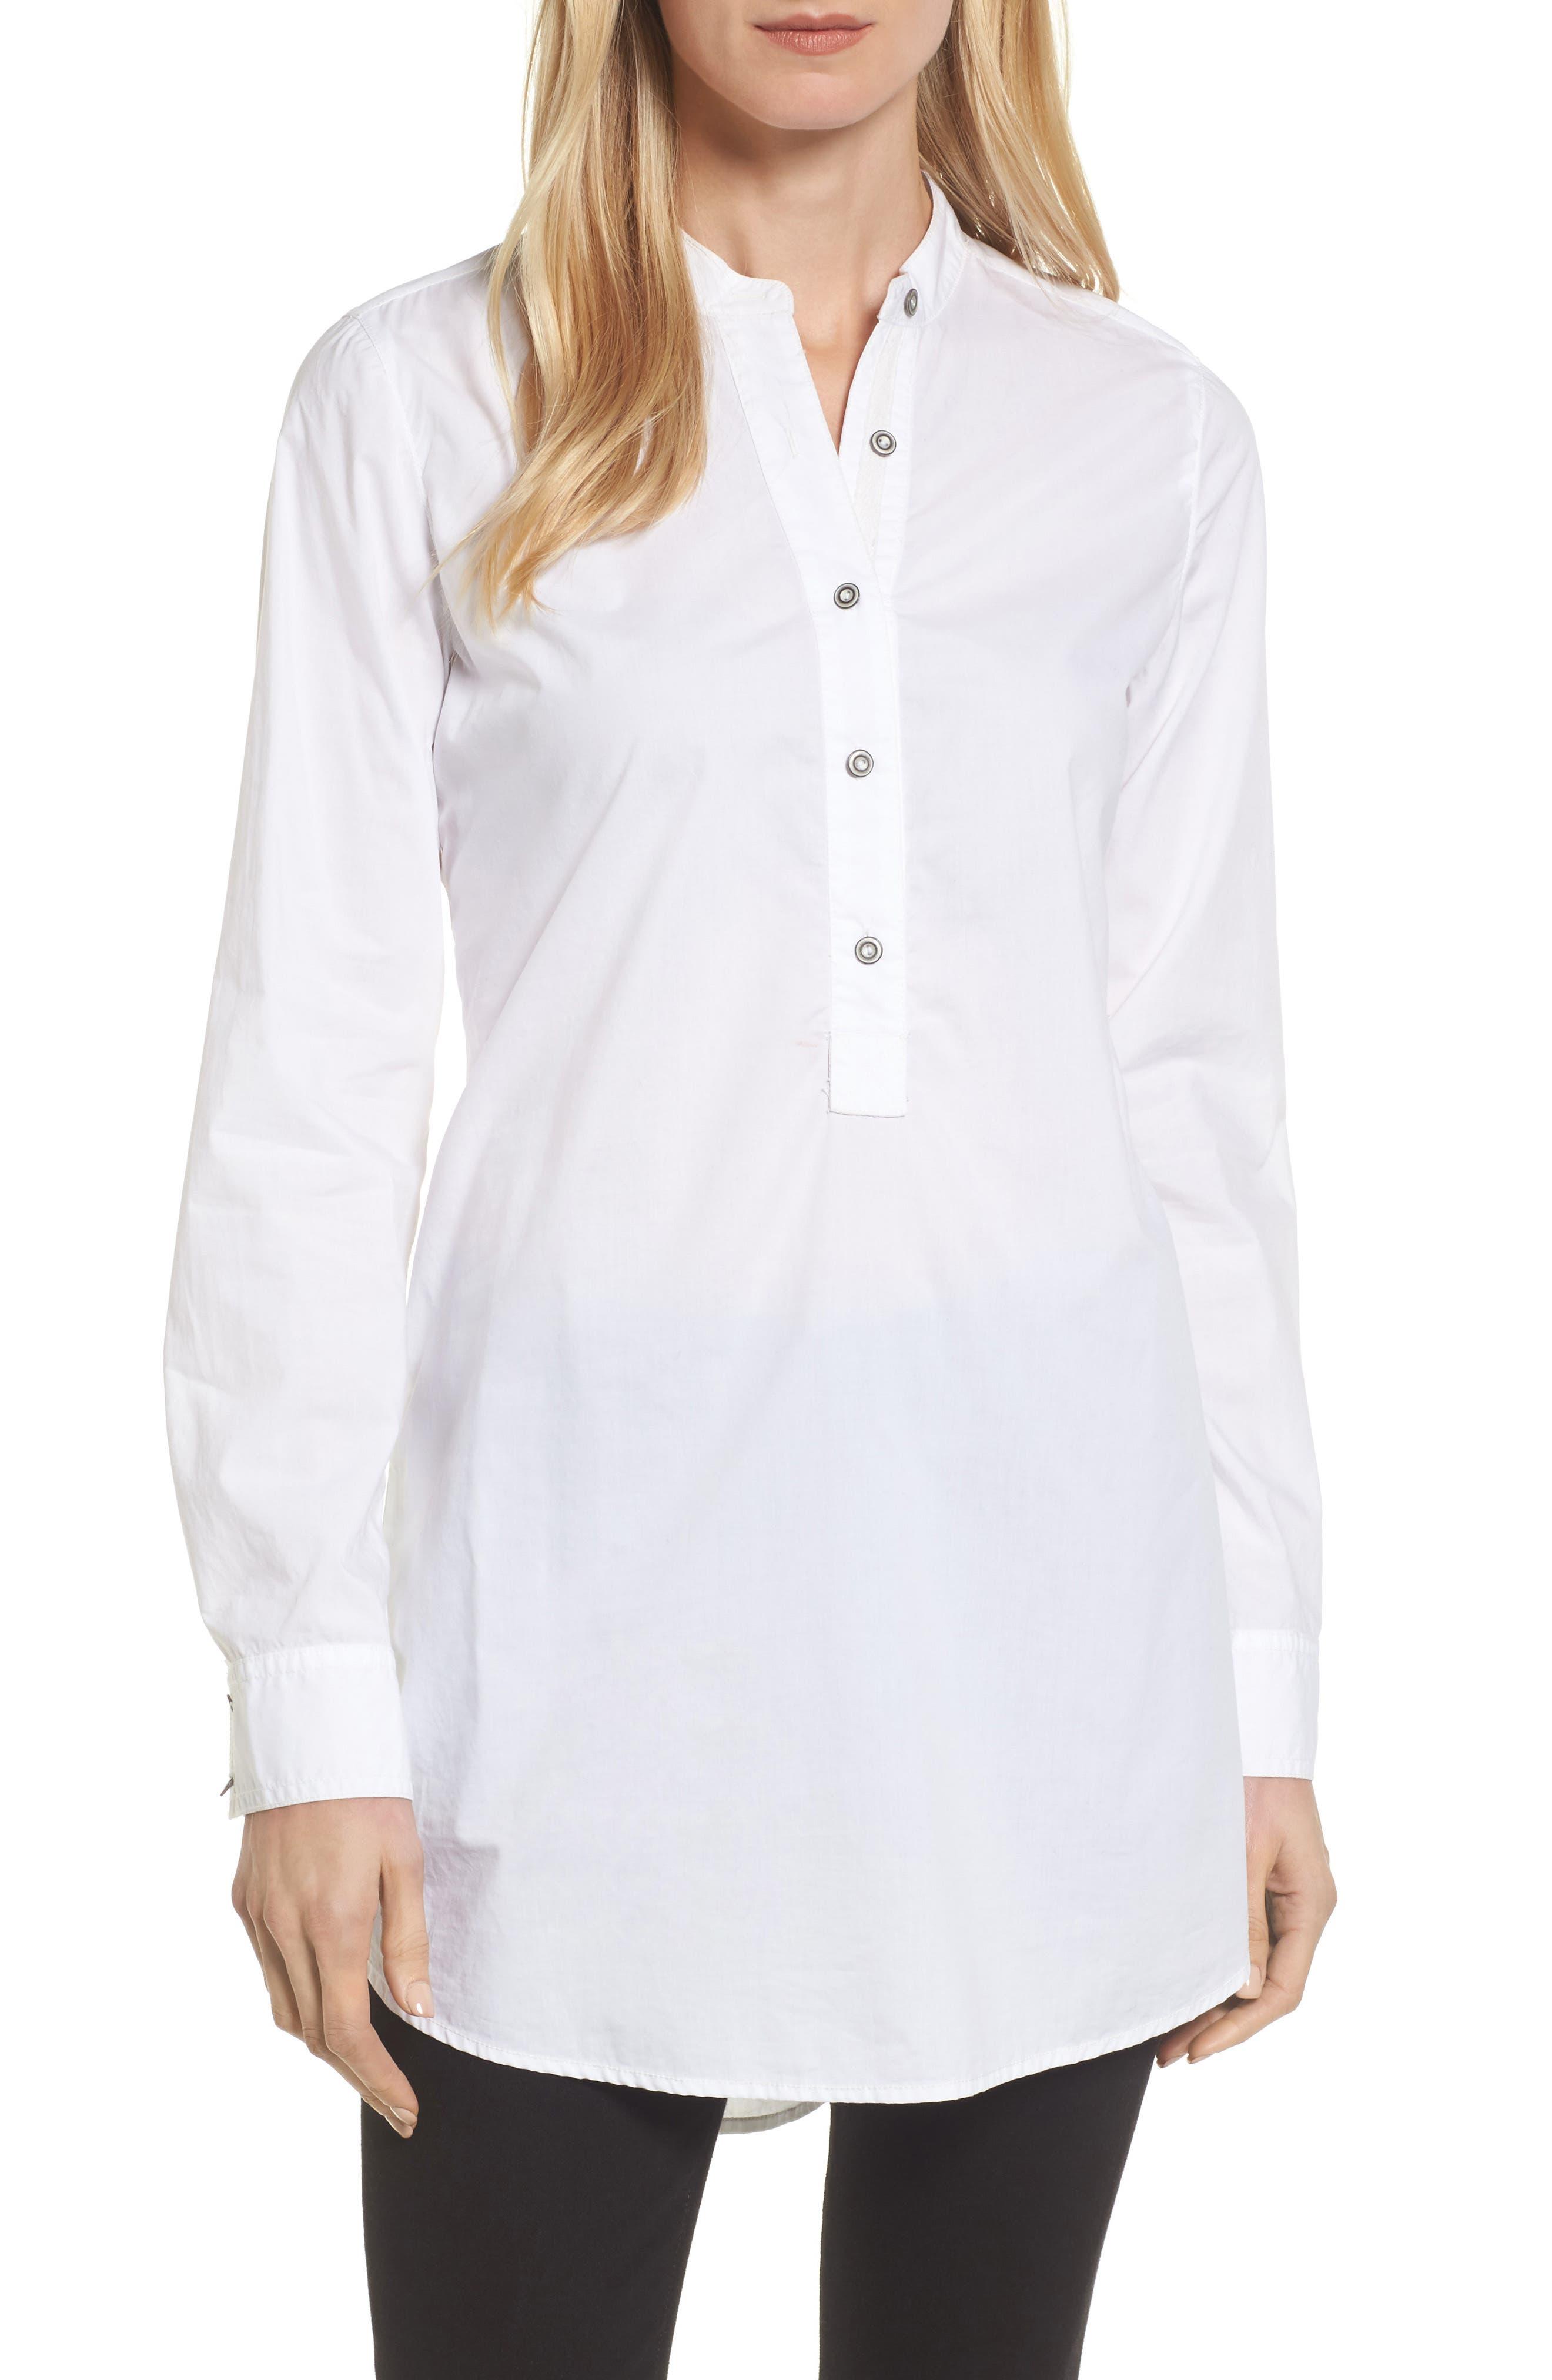 Alternate Image 1 Selected - Caslon® Popover Tunic Shirt (Regular & Petite)